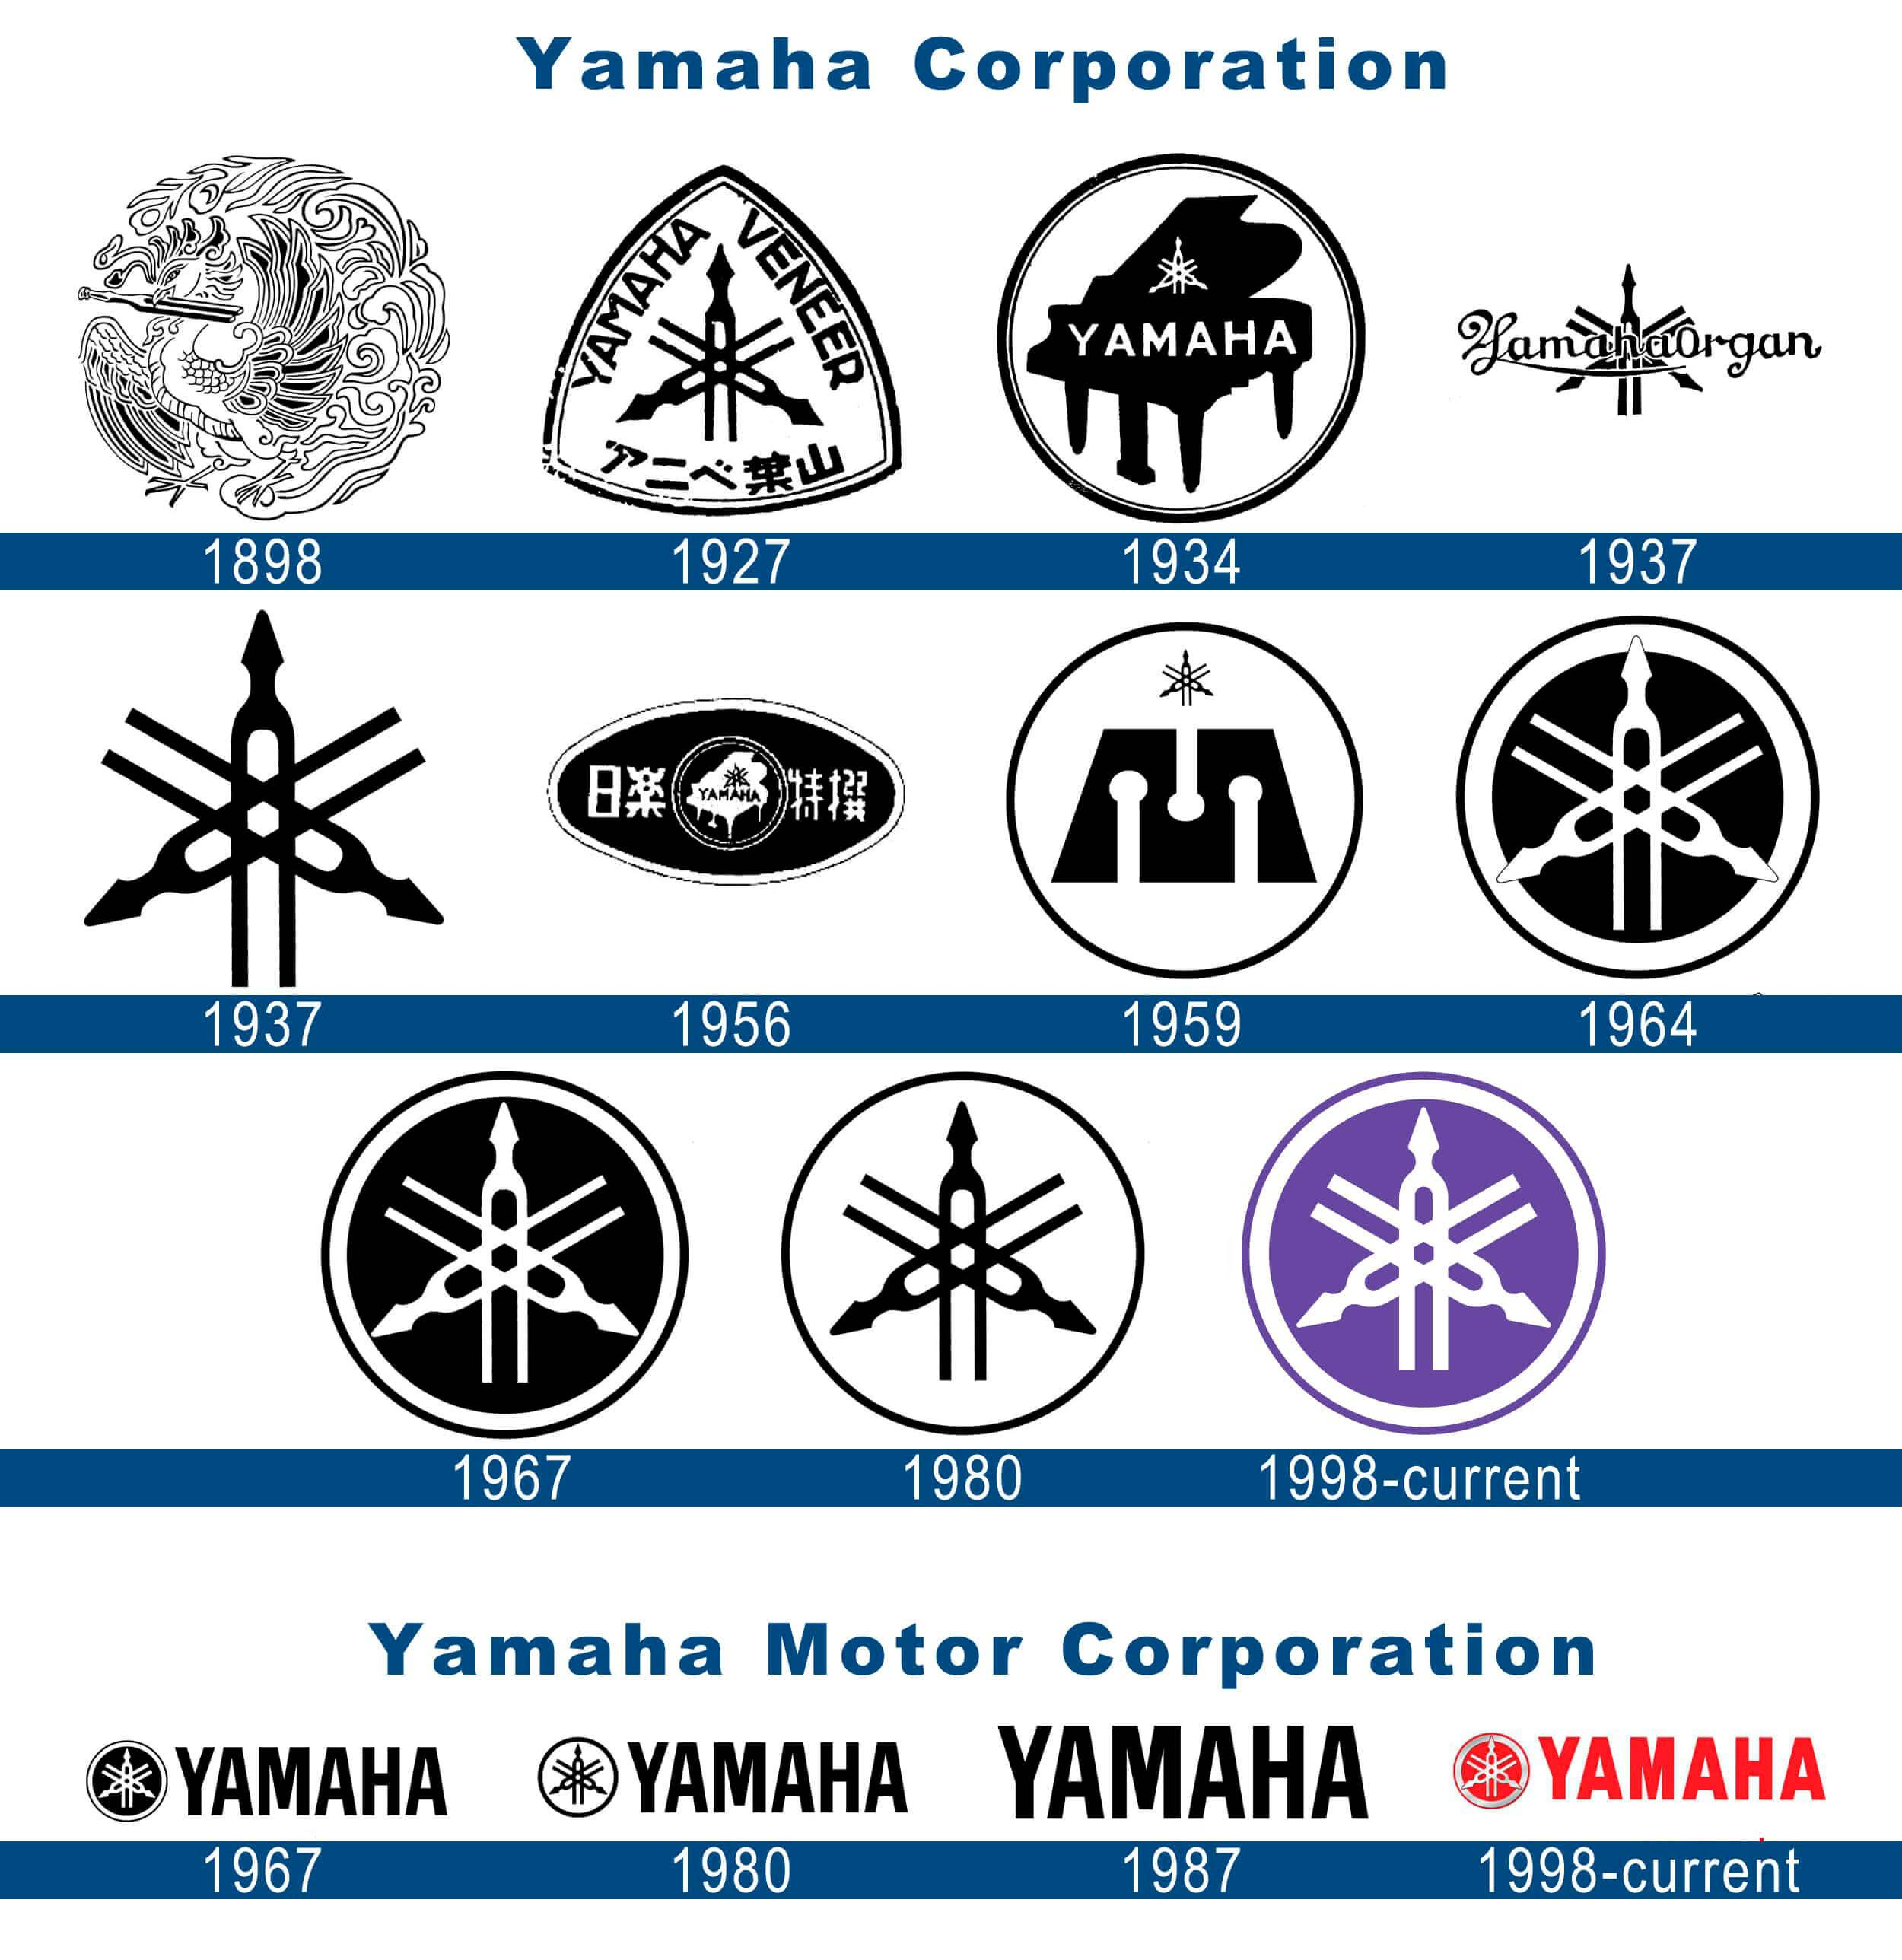 medium resolution of yamaha logo history yamaha logo yamaha motorcycles cars and motorcycles motorcycle logo